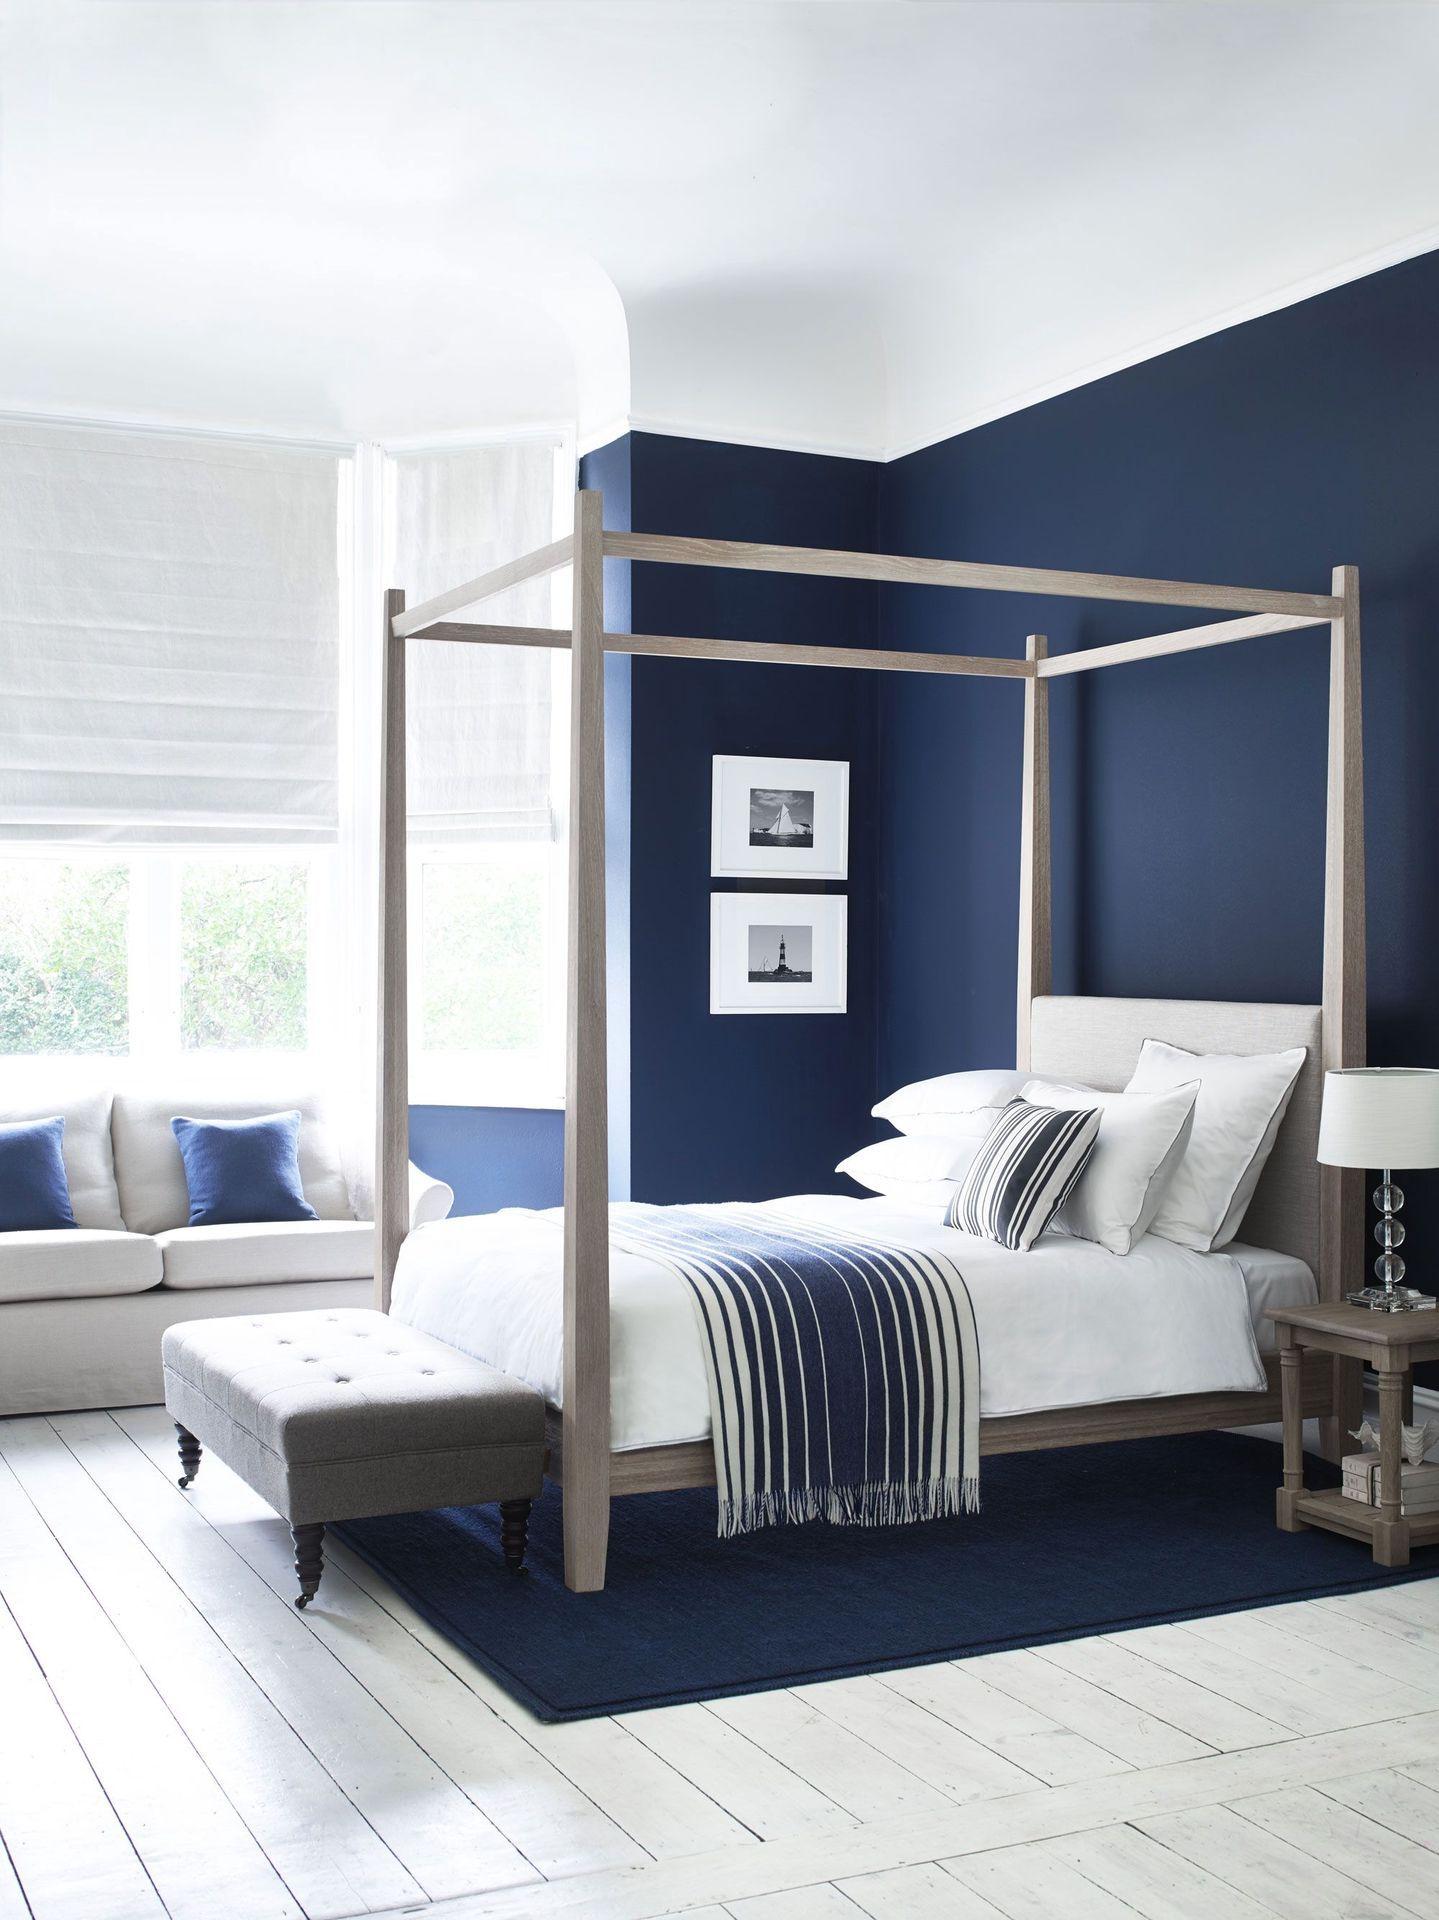 Tfp Dating Preferences Dark Blue Bedrooms Blue Bedroom Walls Blue Bedroom Minimalist blue room paint